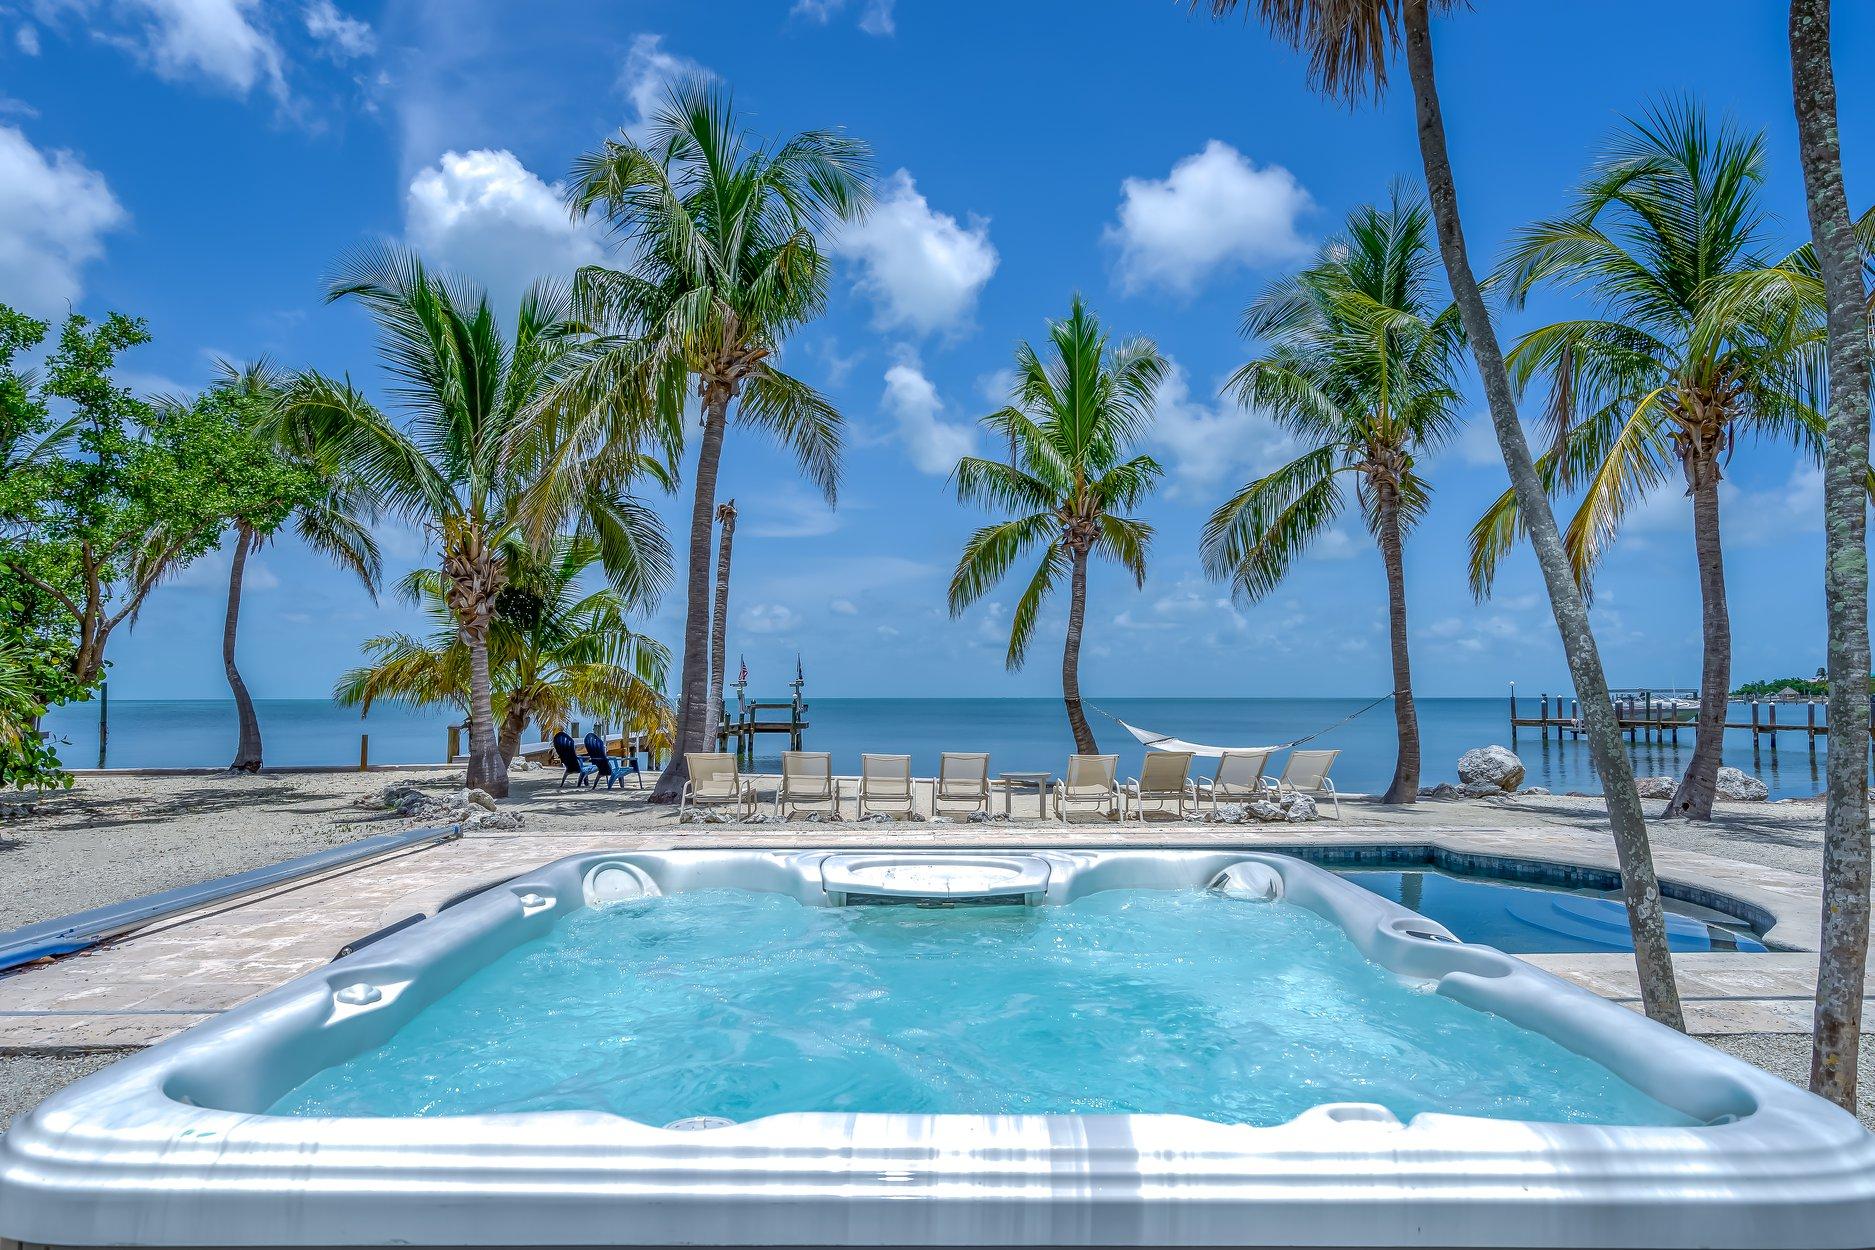 Florida Keys Vacation Rentals Rental Properties throughout Key West and Upper Keys